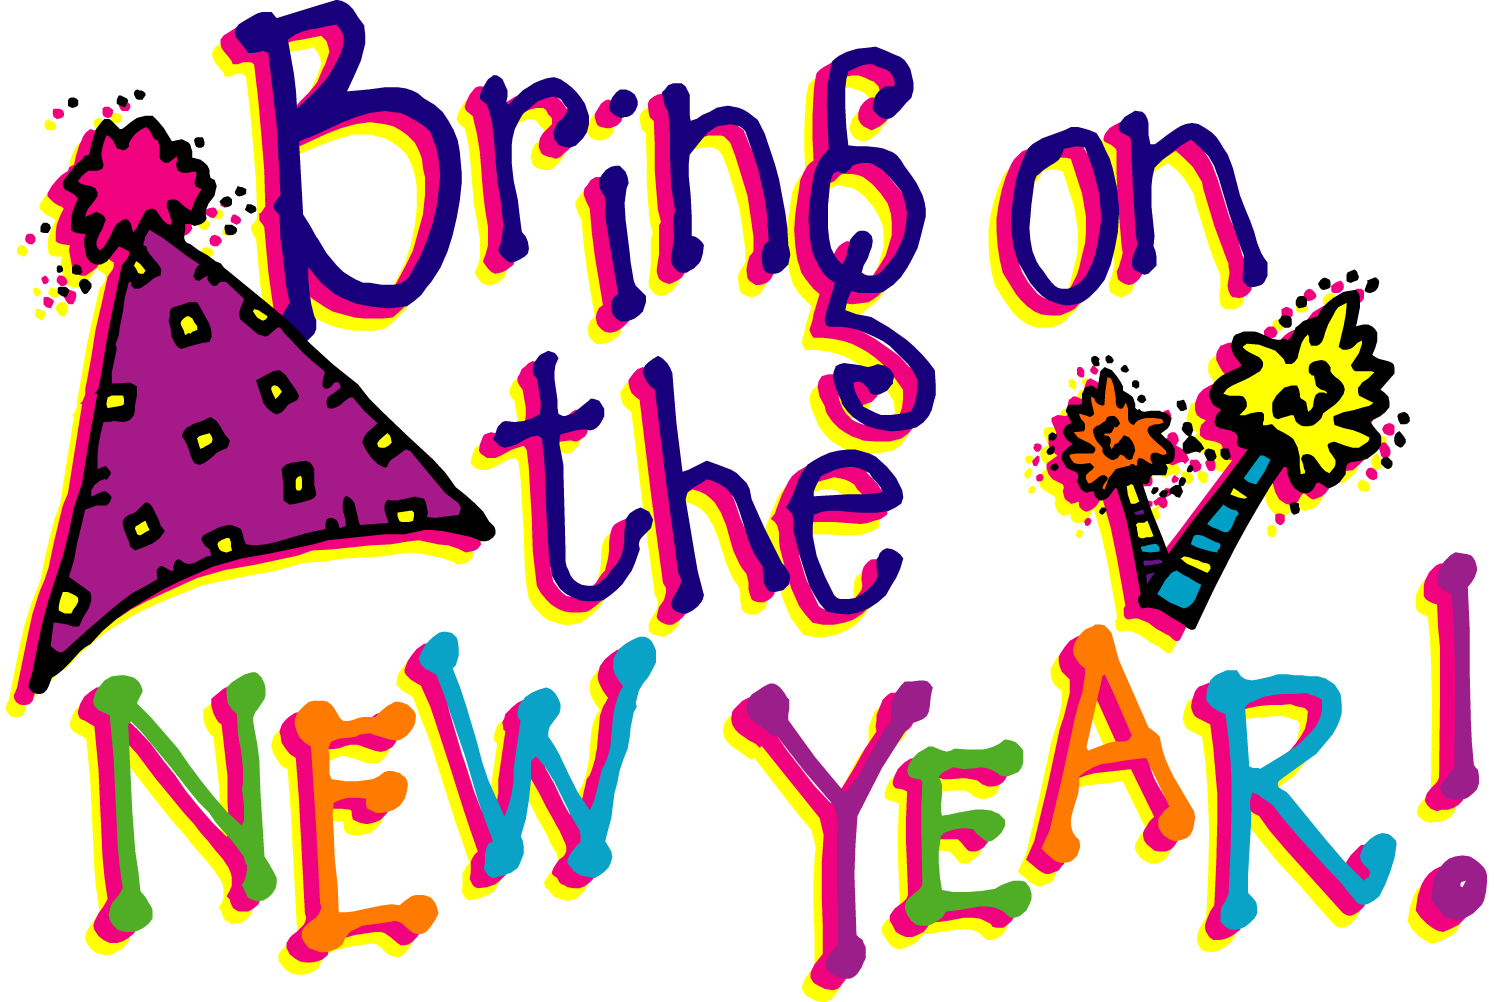 Happy new year clipart 6 .-Happy new year clipart 6 .-2